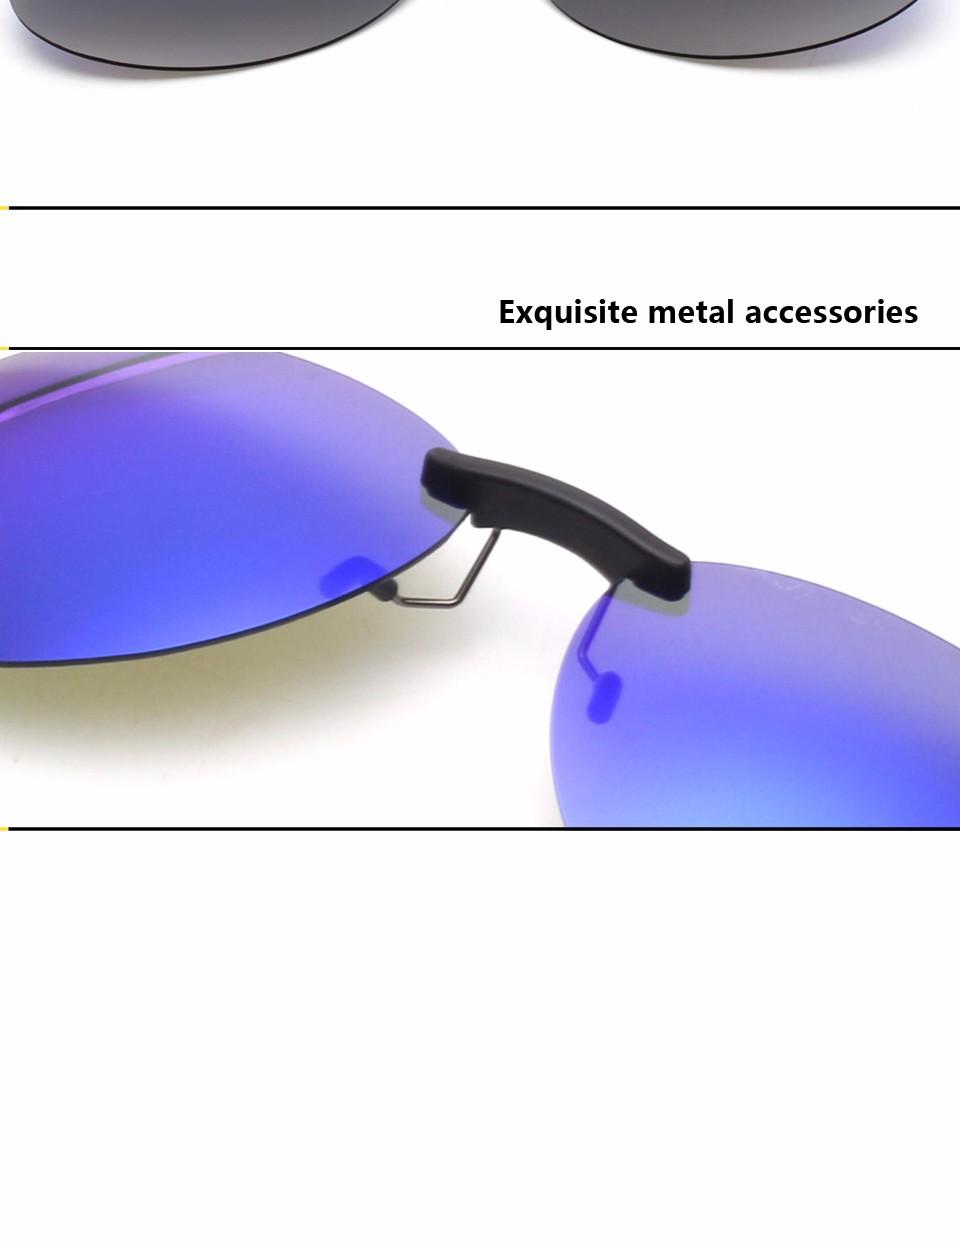 b485500eaea89 ᐃClipe de óculos de sol Mulheres Polarizada Clip sobre óculos de ...